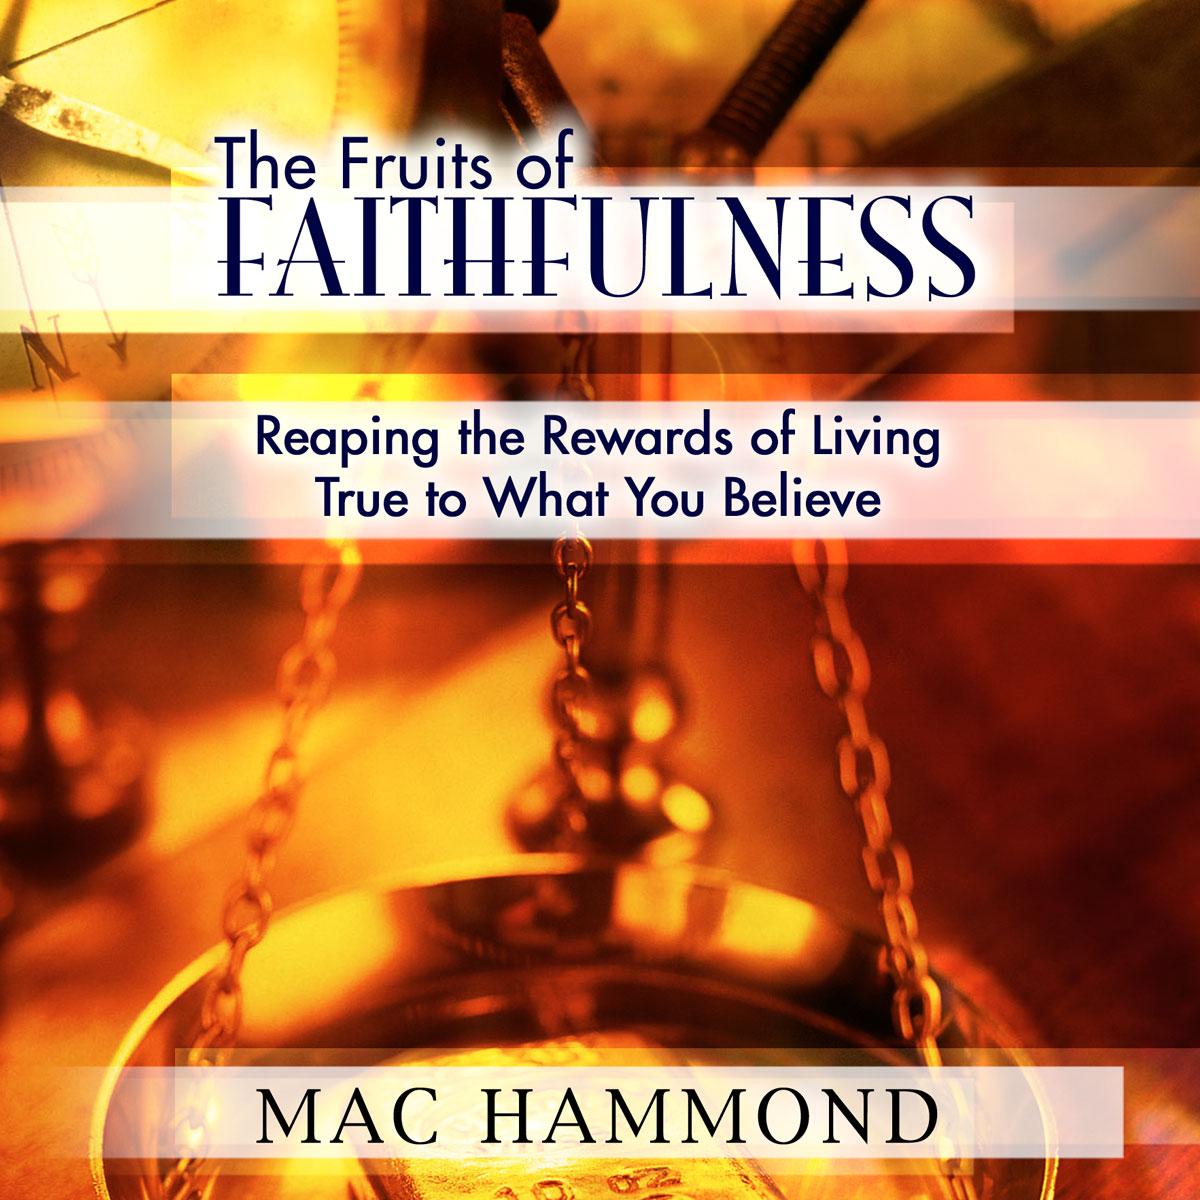 FruitOfFaithfullness